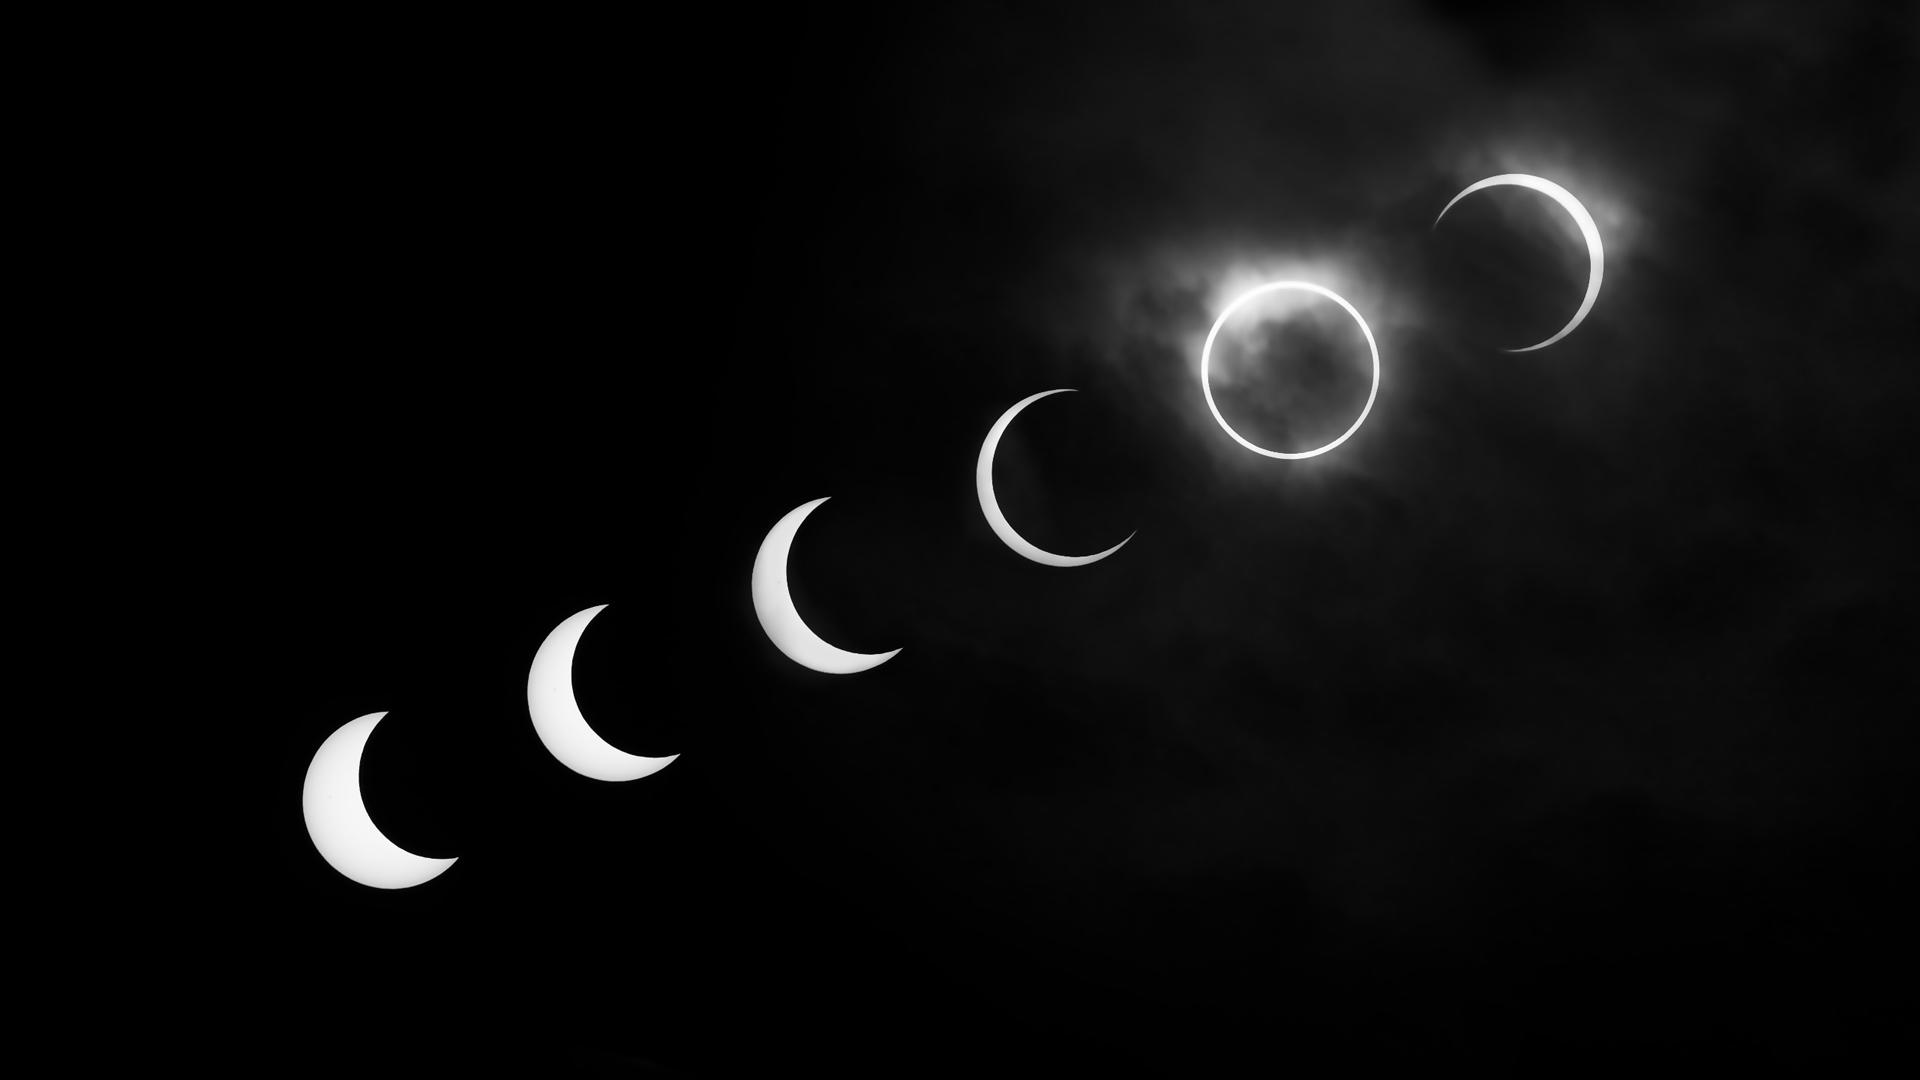 Solar eclipse black and white desktop wallpaper 1920x1080